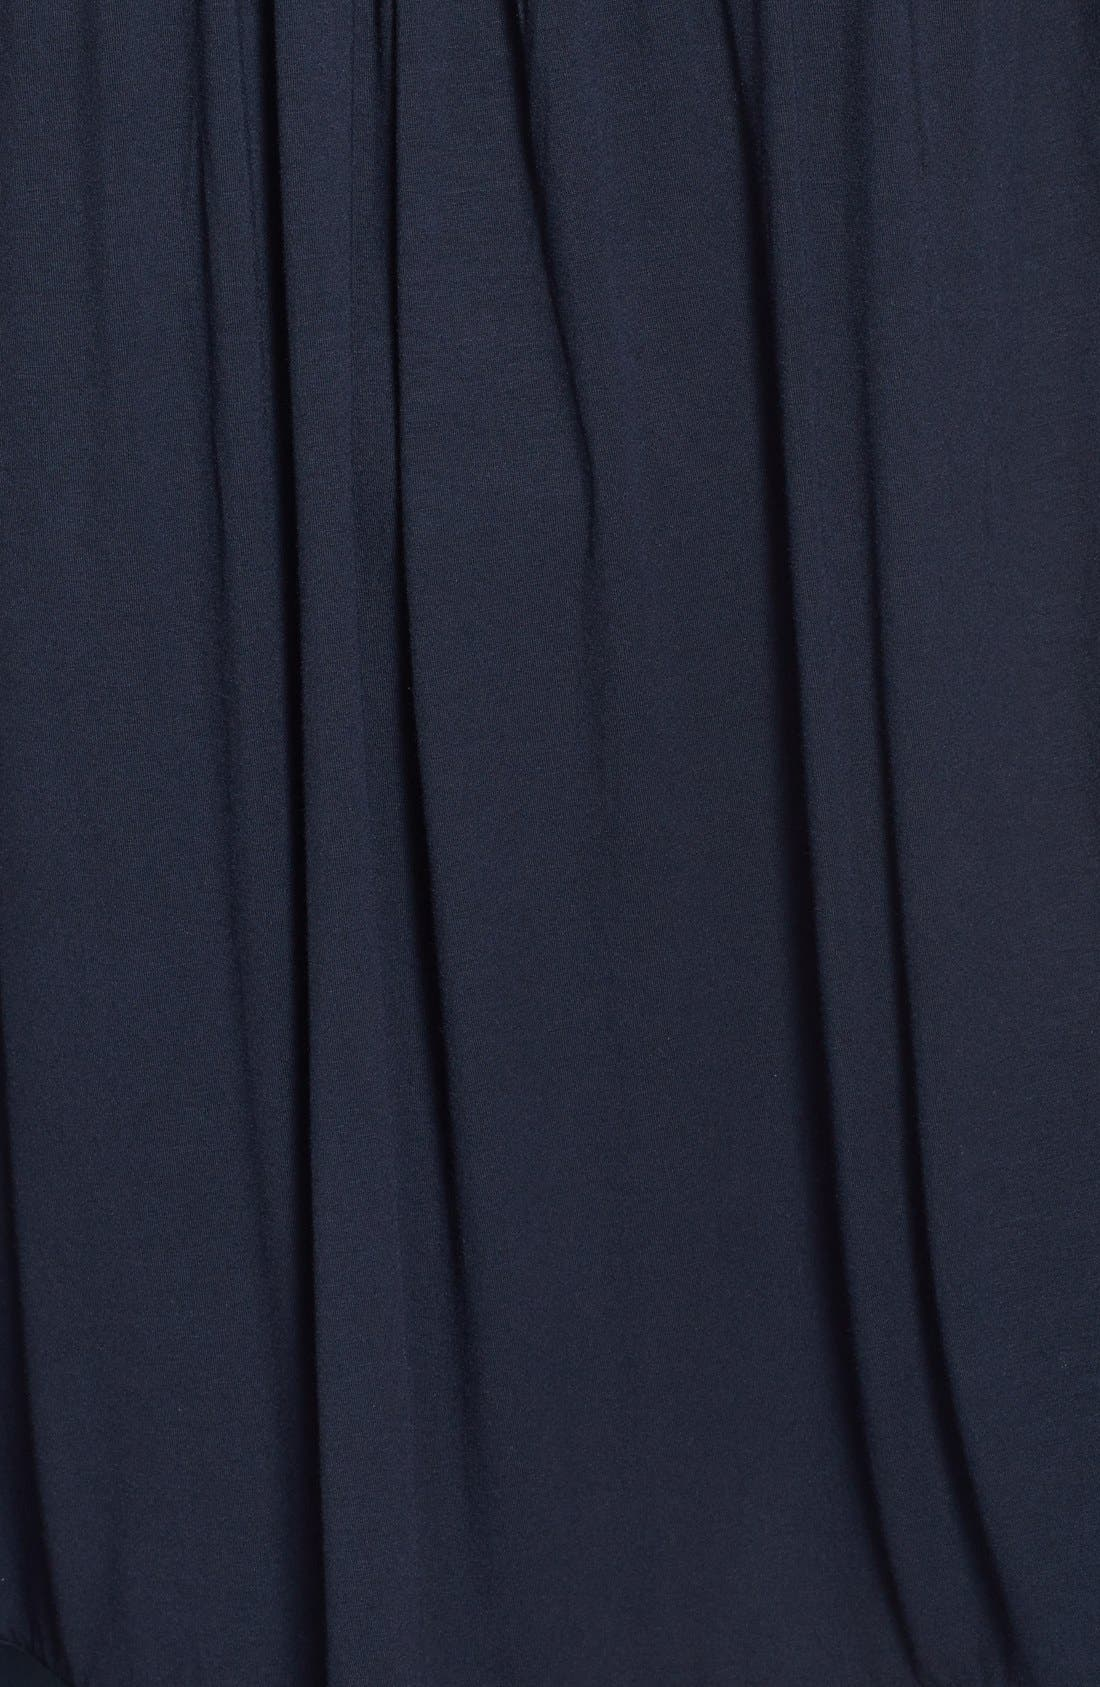 Alternate Image 3  - Midnight by Carole Hochman Satin Detail Chemise (Plus Size)